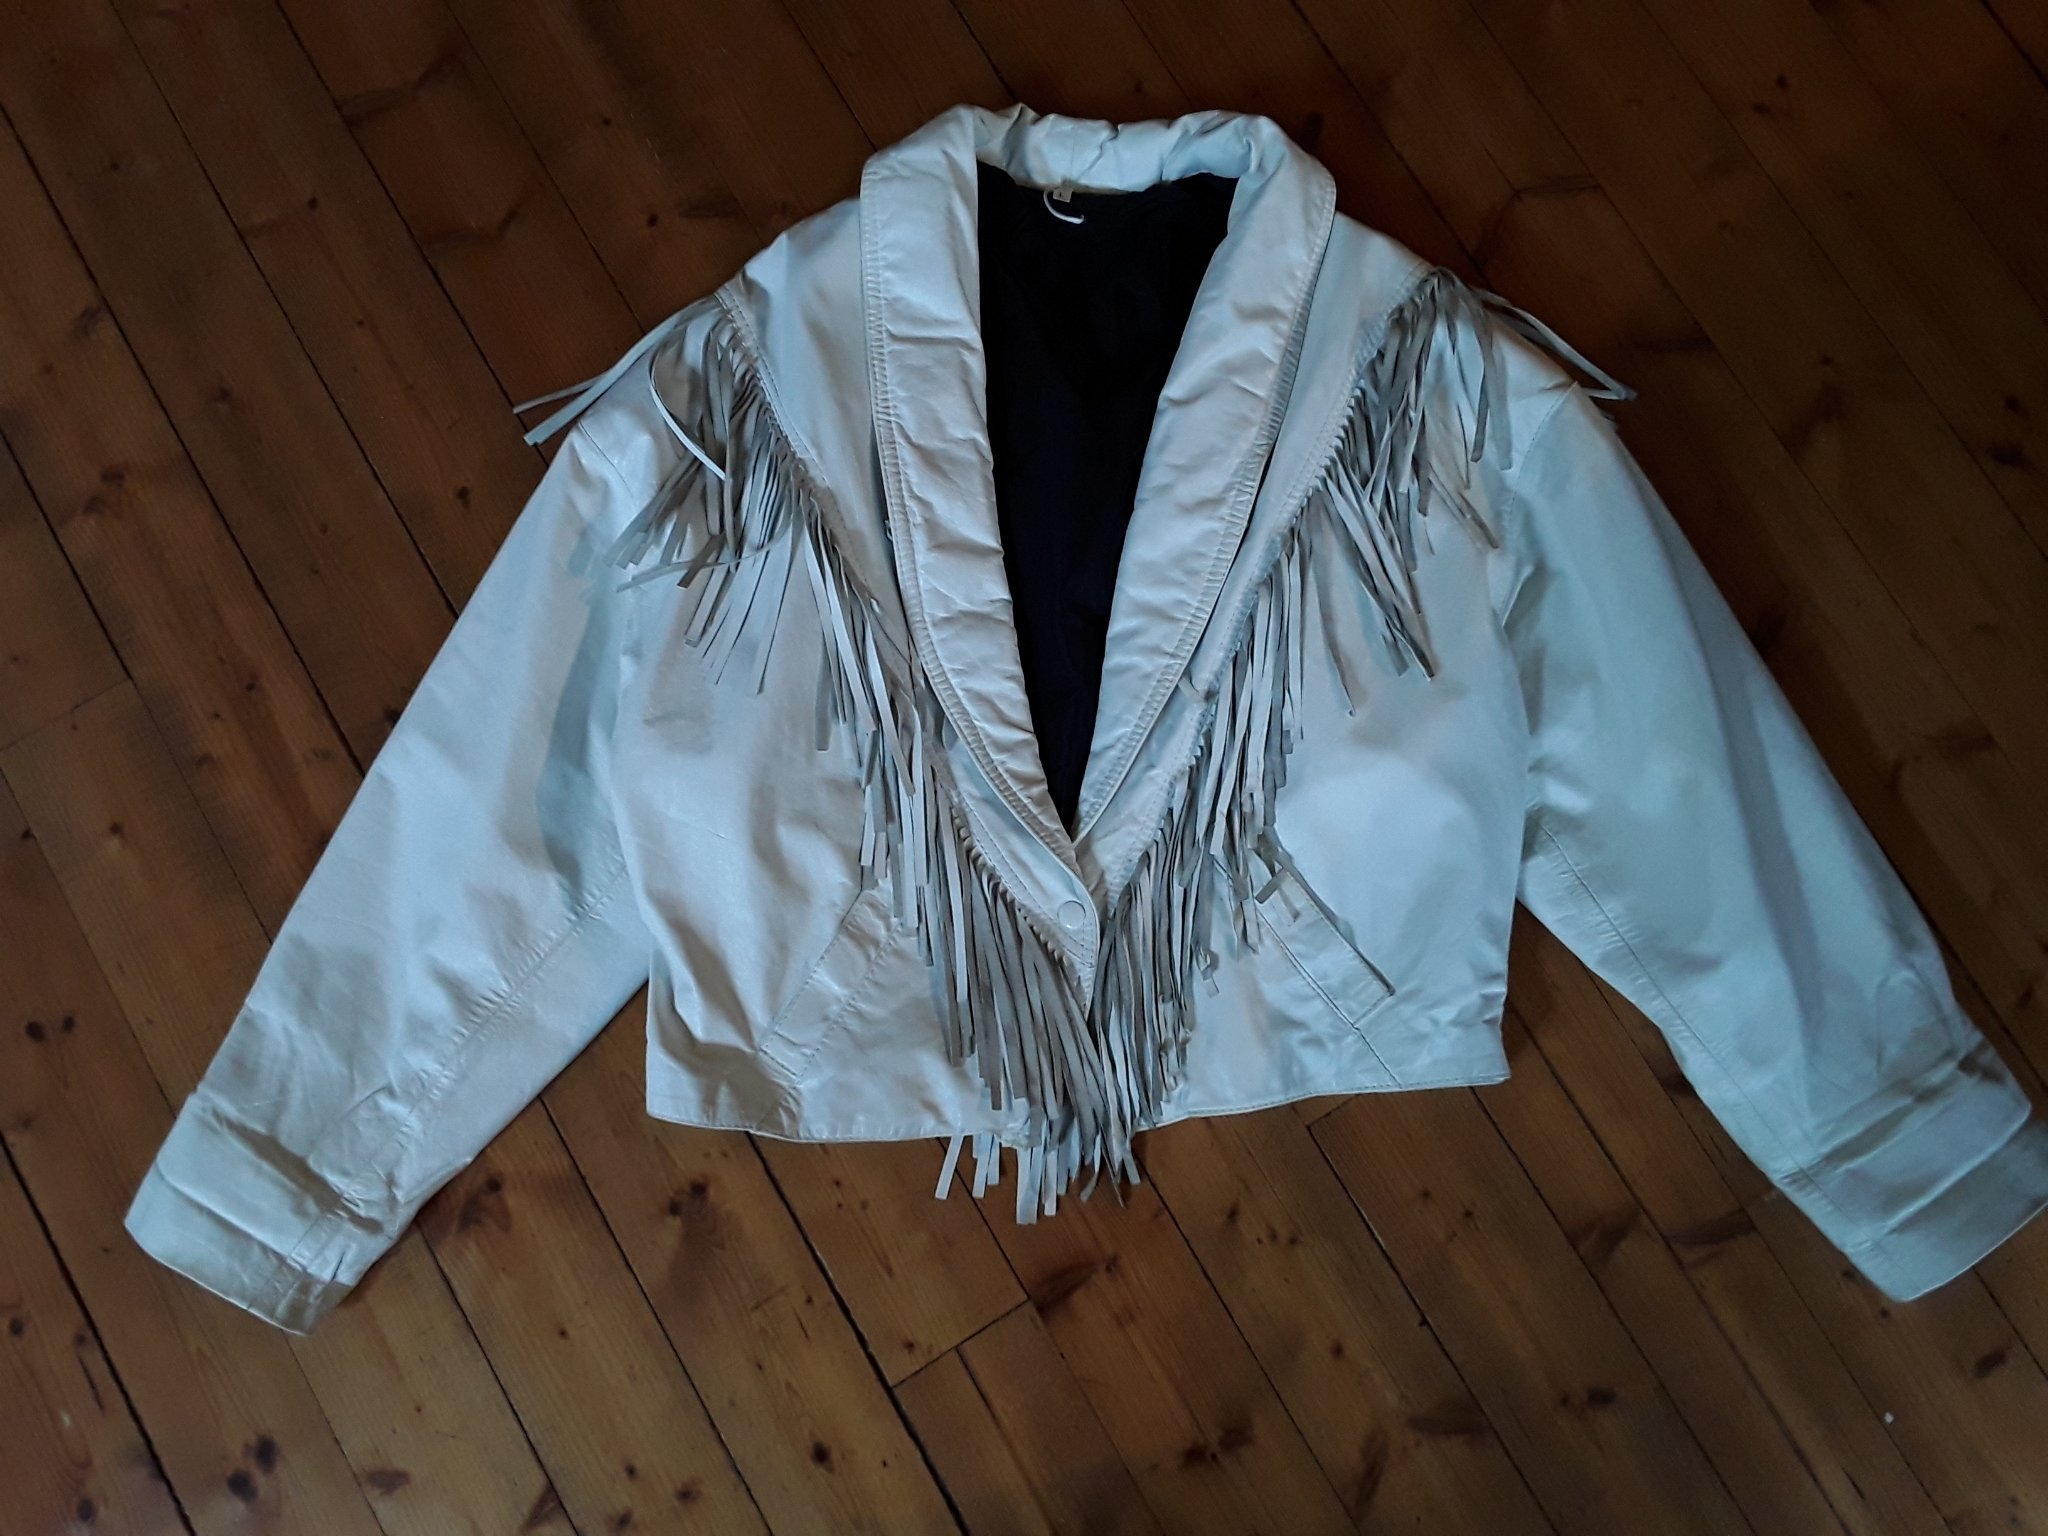 80 tal vintage skinn frans jacka